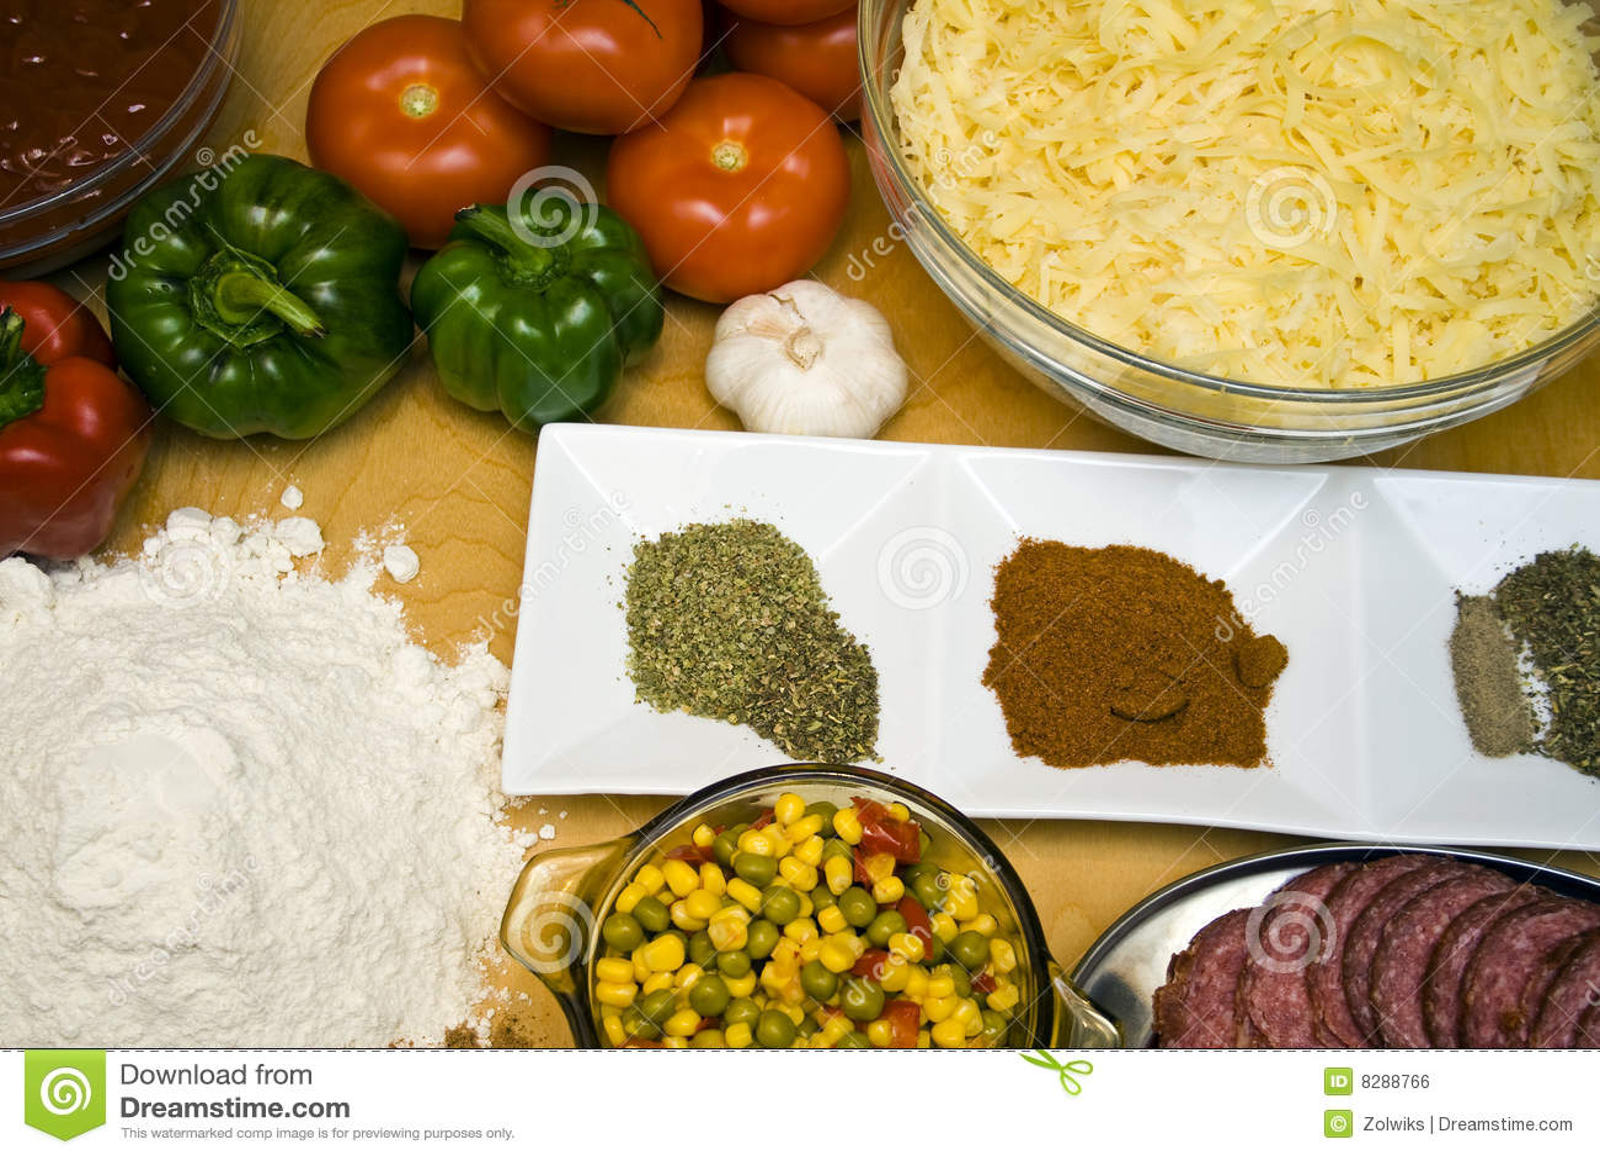 Tasty Ingredients Royalty Free Stock Image - Image: 8288766